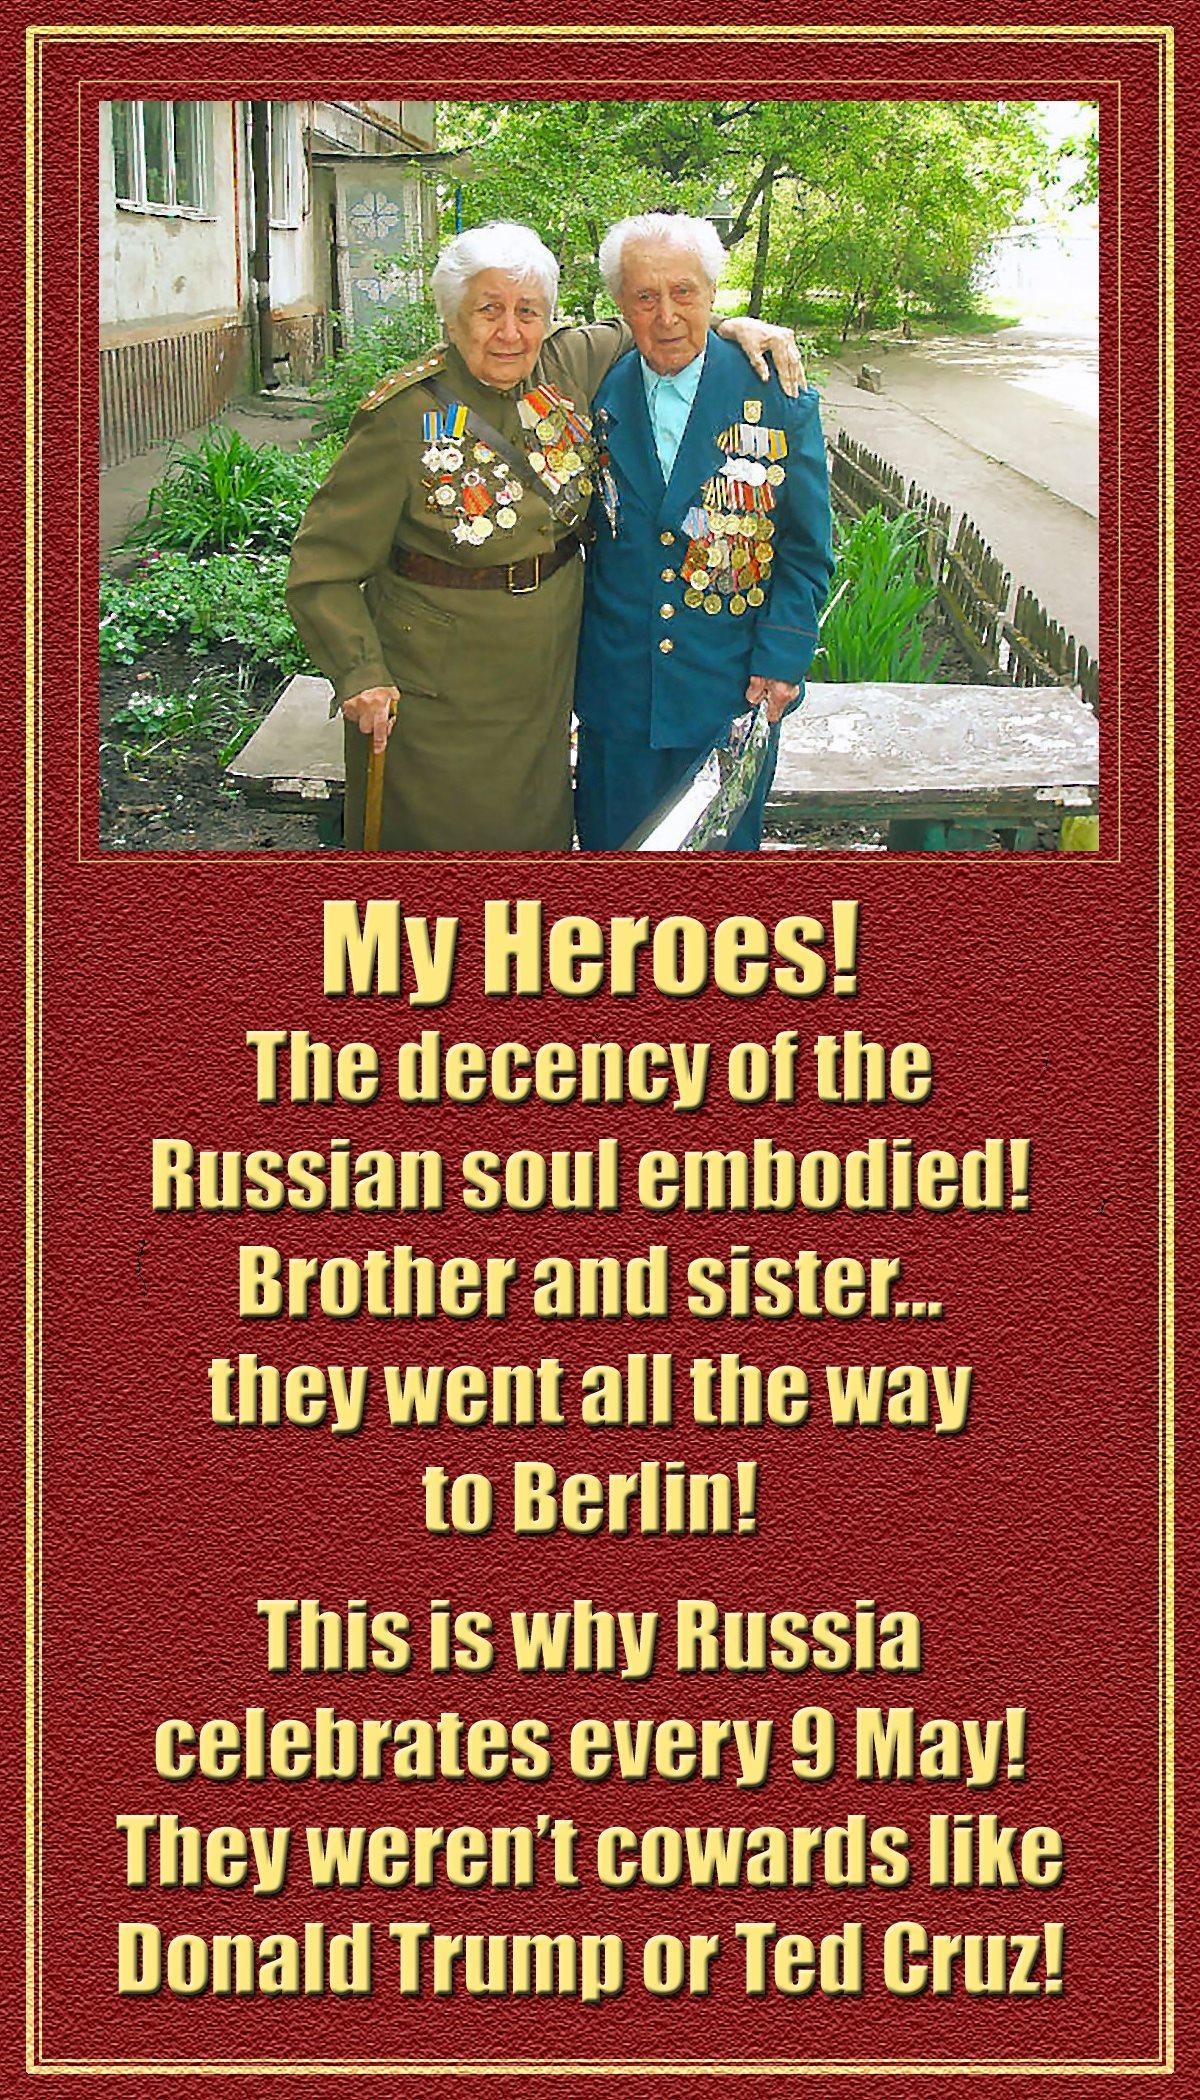 00 russia. veterans VOV 01 130216